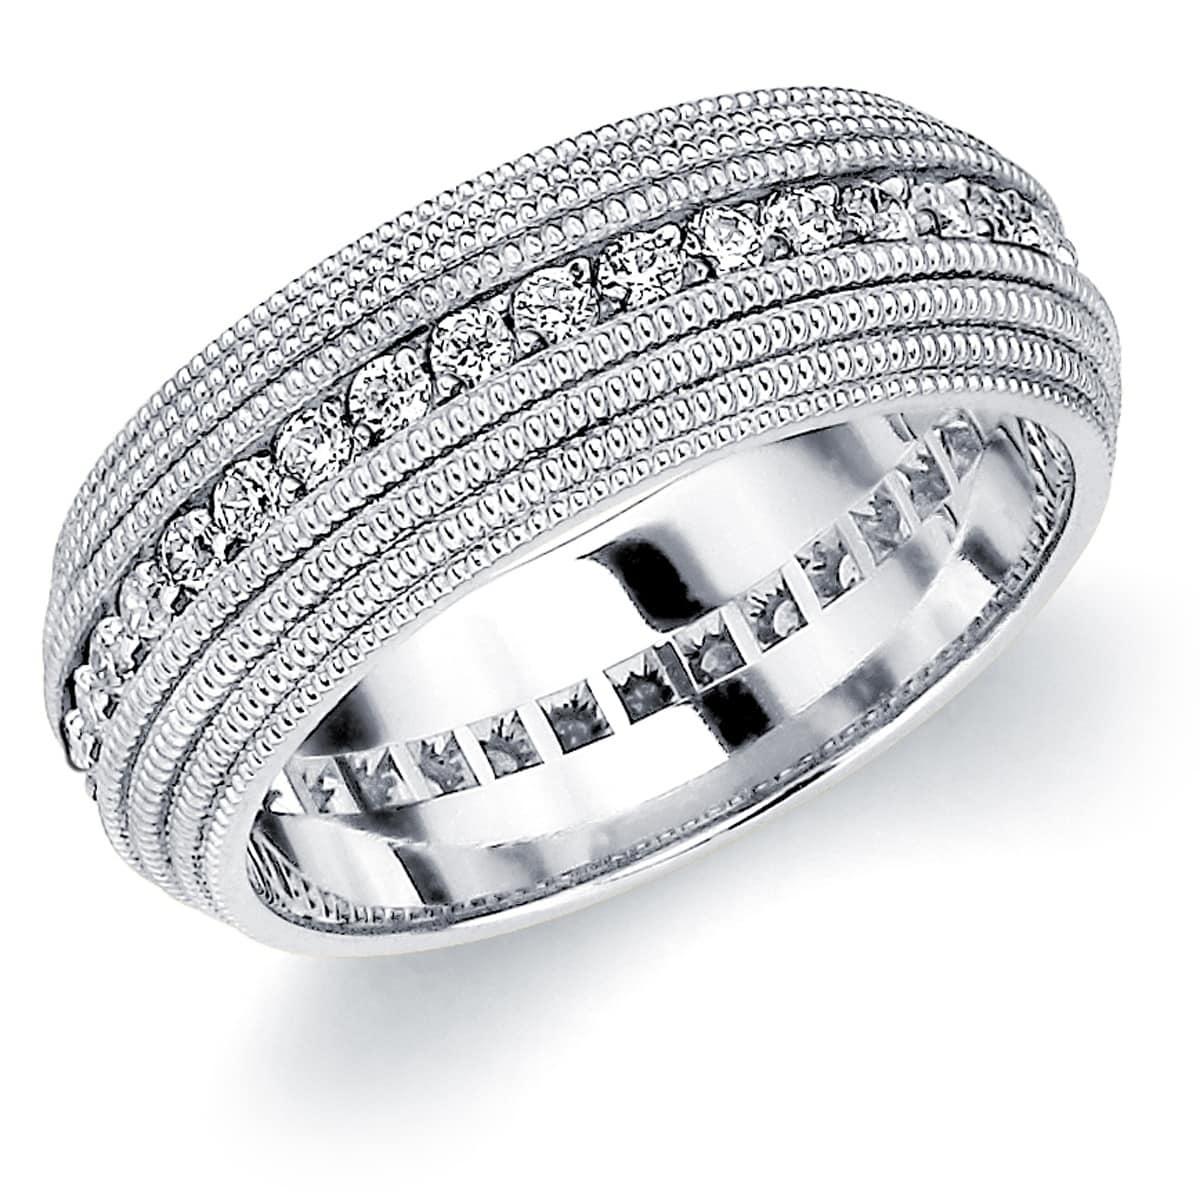 9e9add05642 Amore 10K White Gold Men s .75 CTTW Diamond Eternity Wedding Band with 4  Row Milgrain